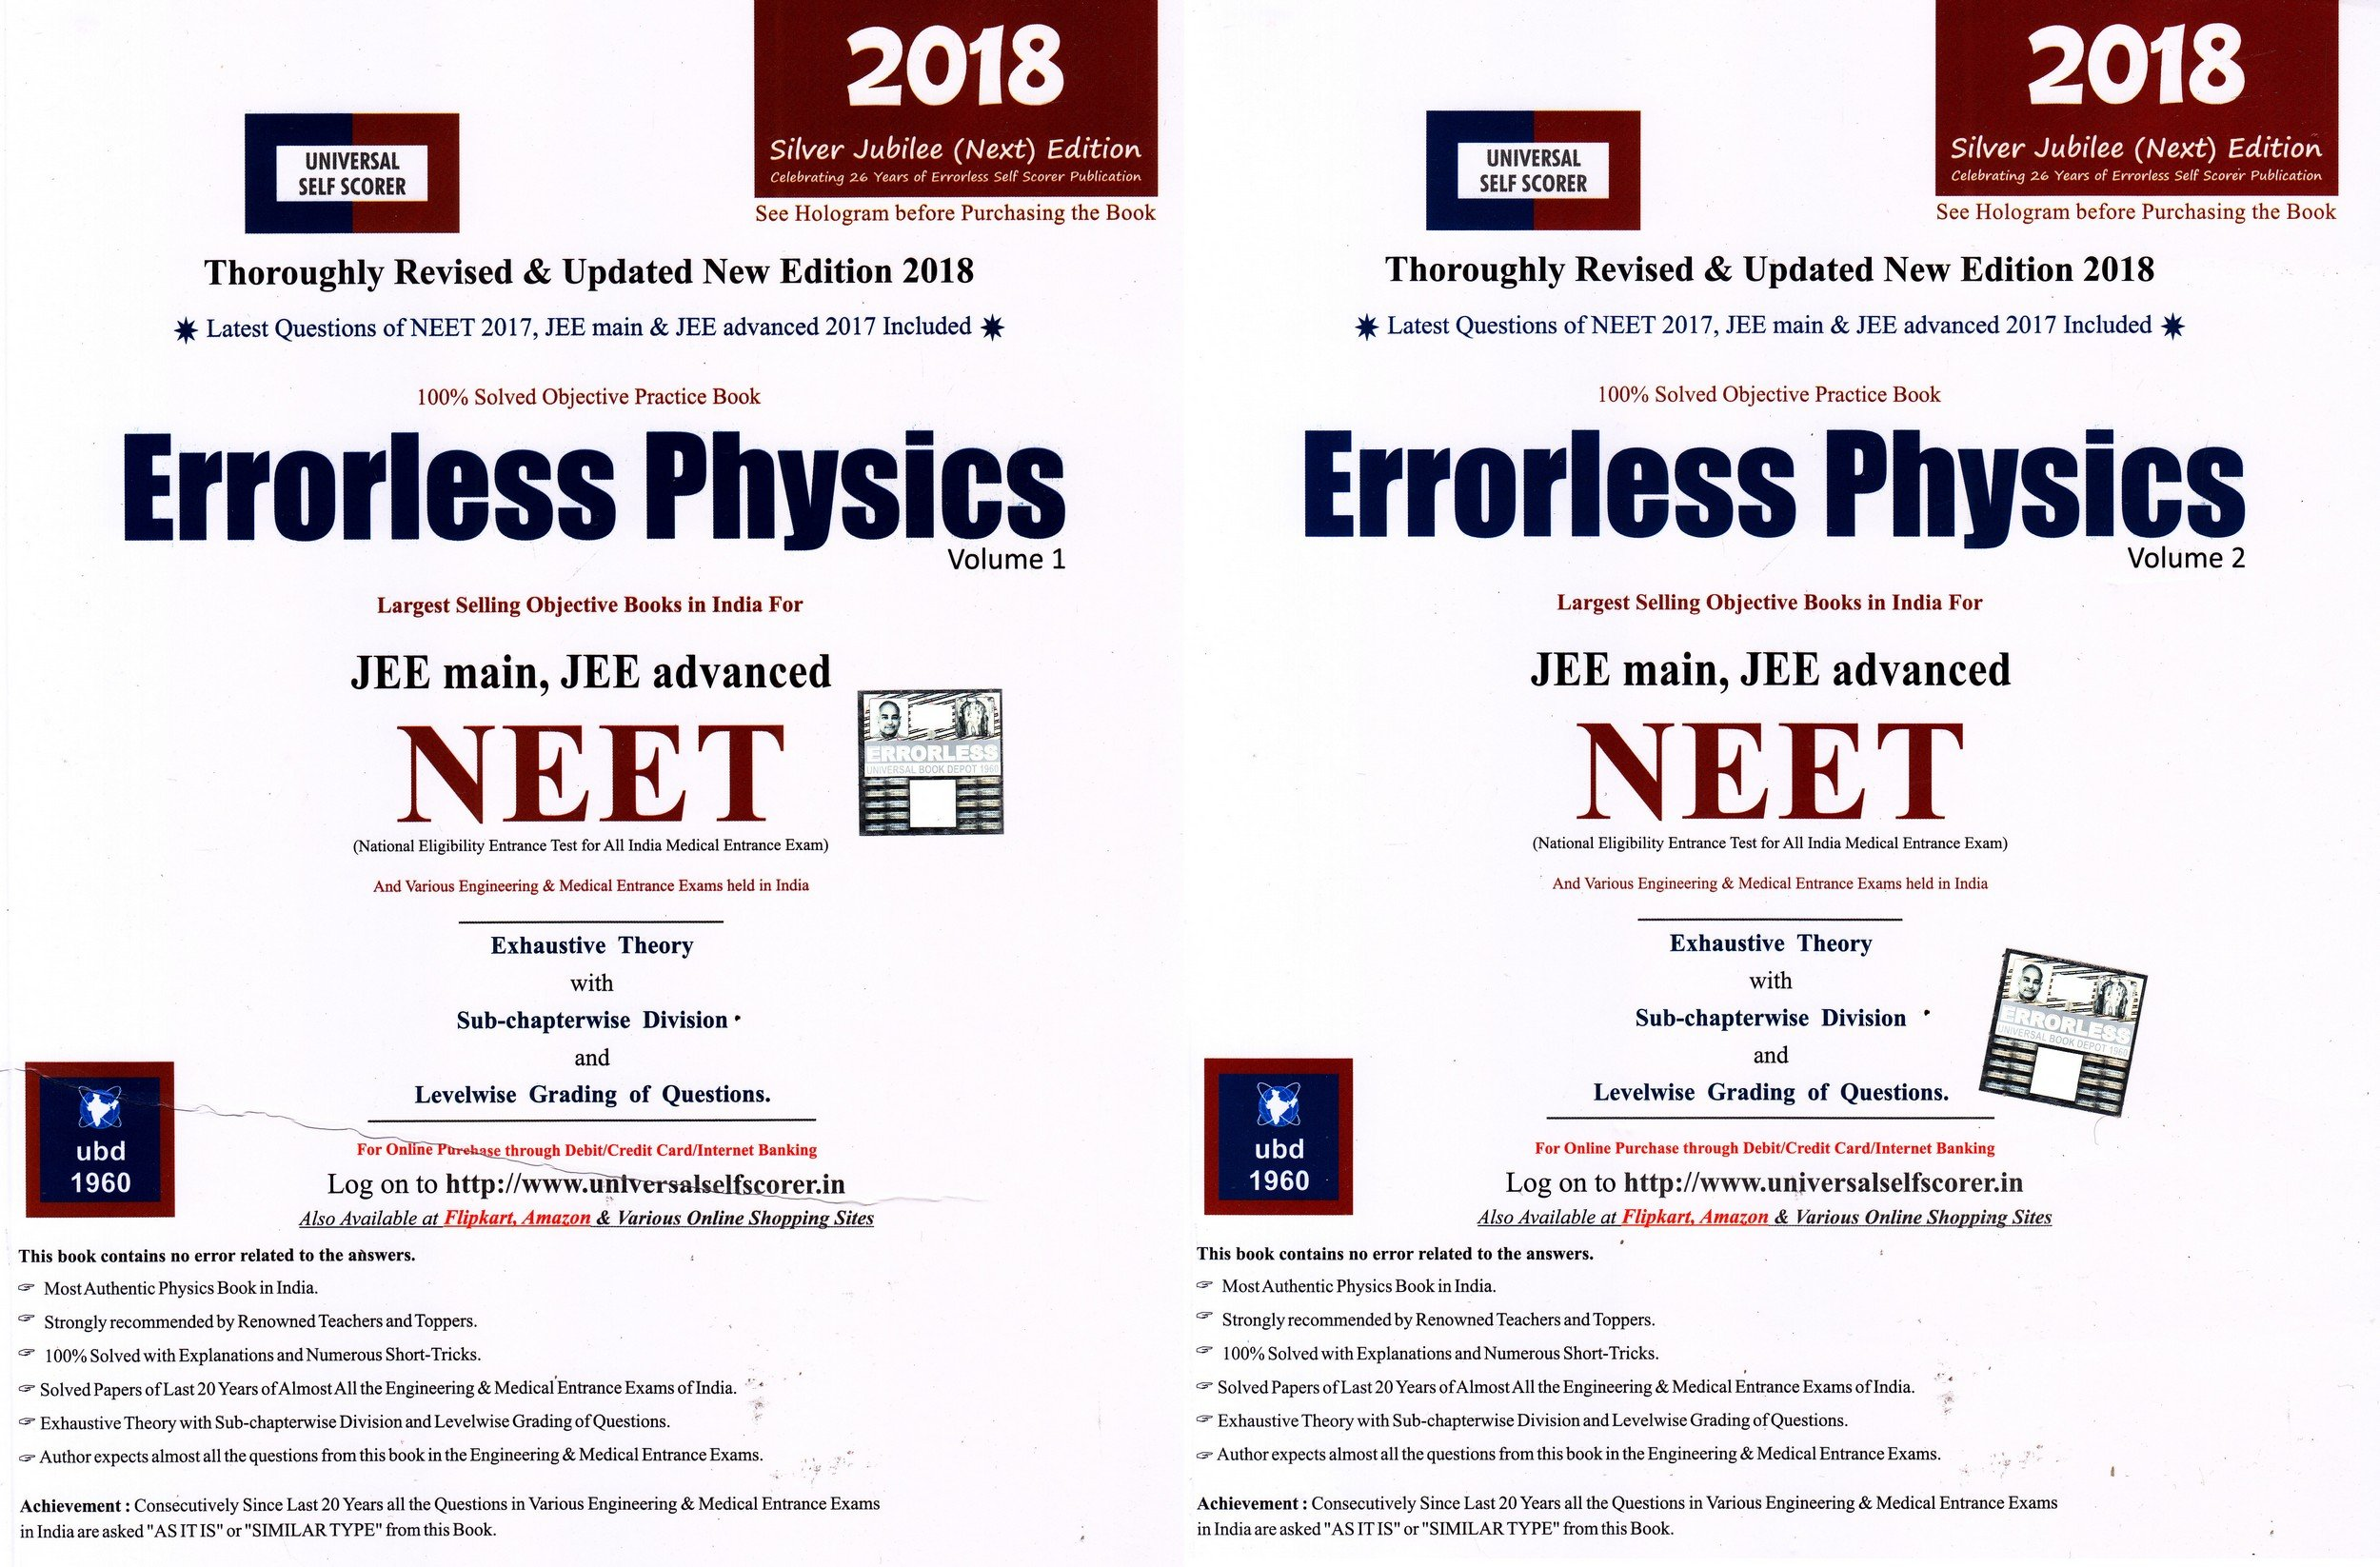 Errorless Physics for JEE Main, JEE Advanced, NEET Set of 2 Volume